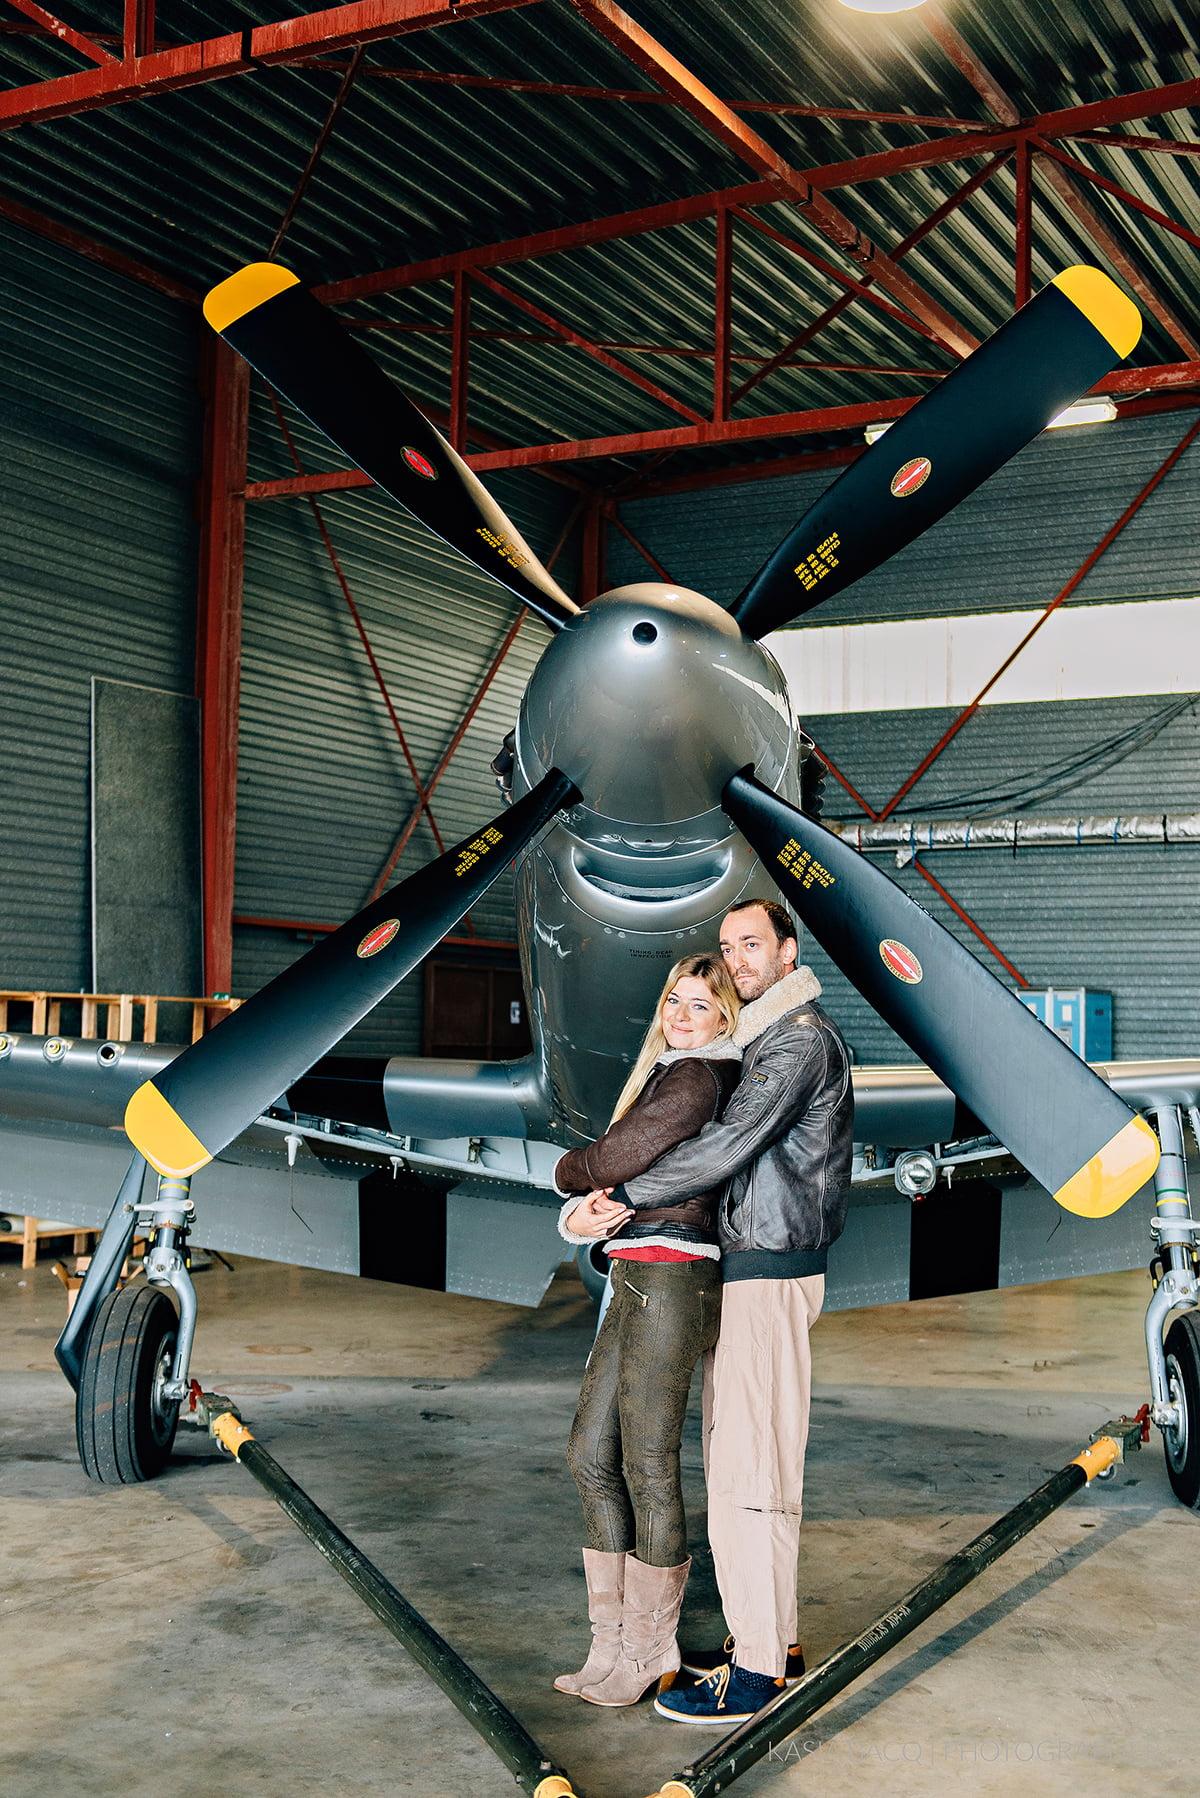 Mustang Antwerp Airport Birthday Flight Kasia Bacq-25